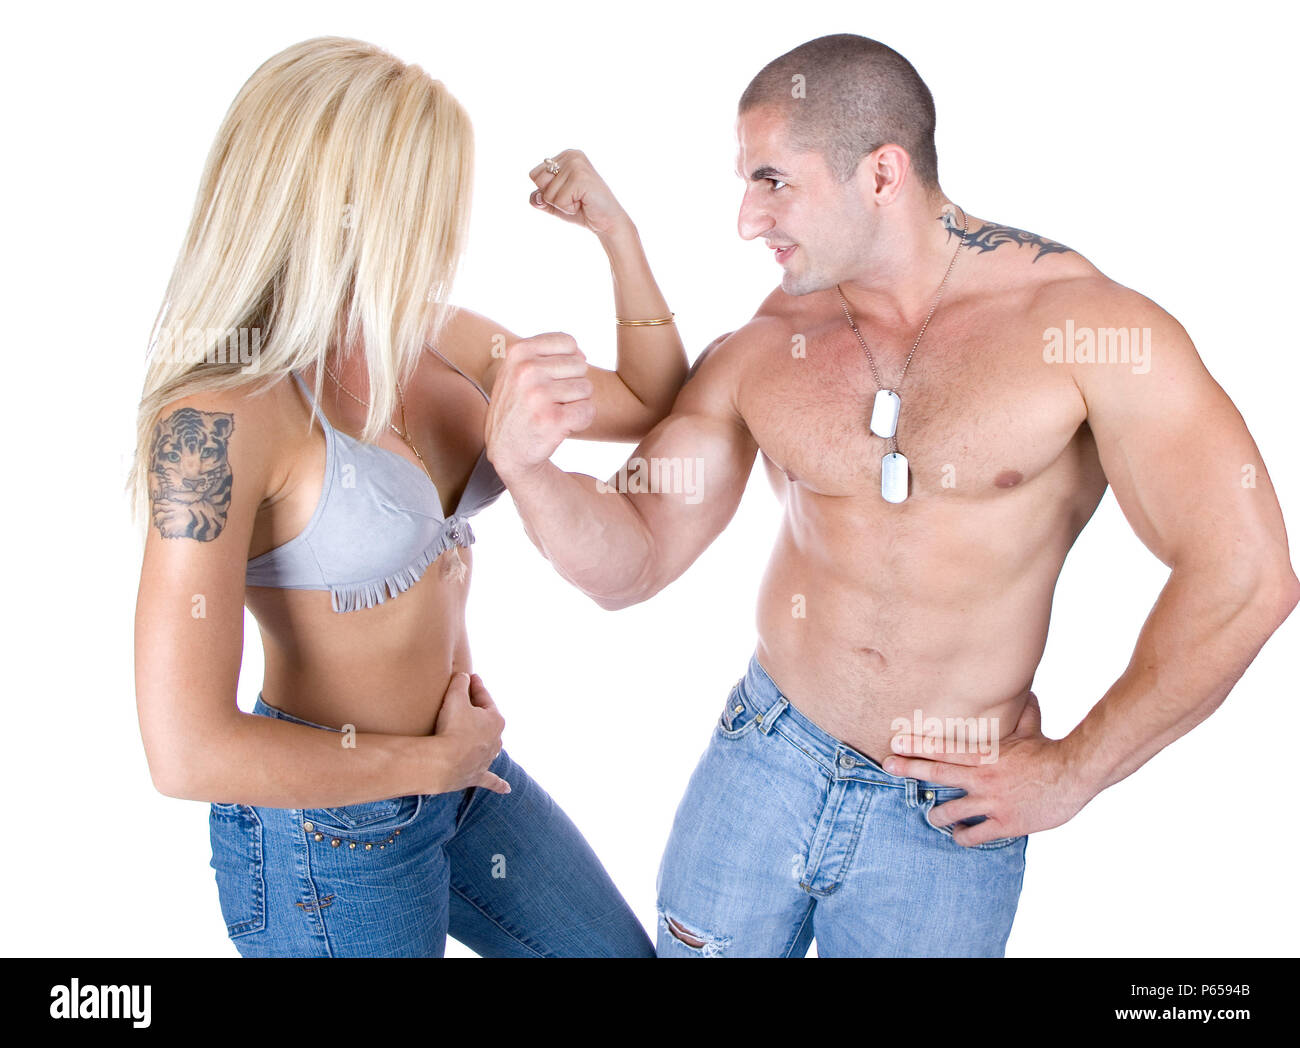 Frau stärker als mann